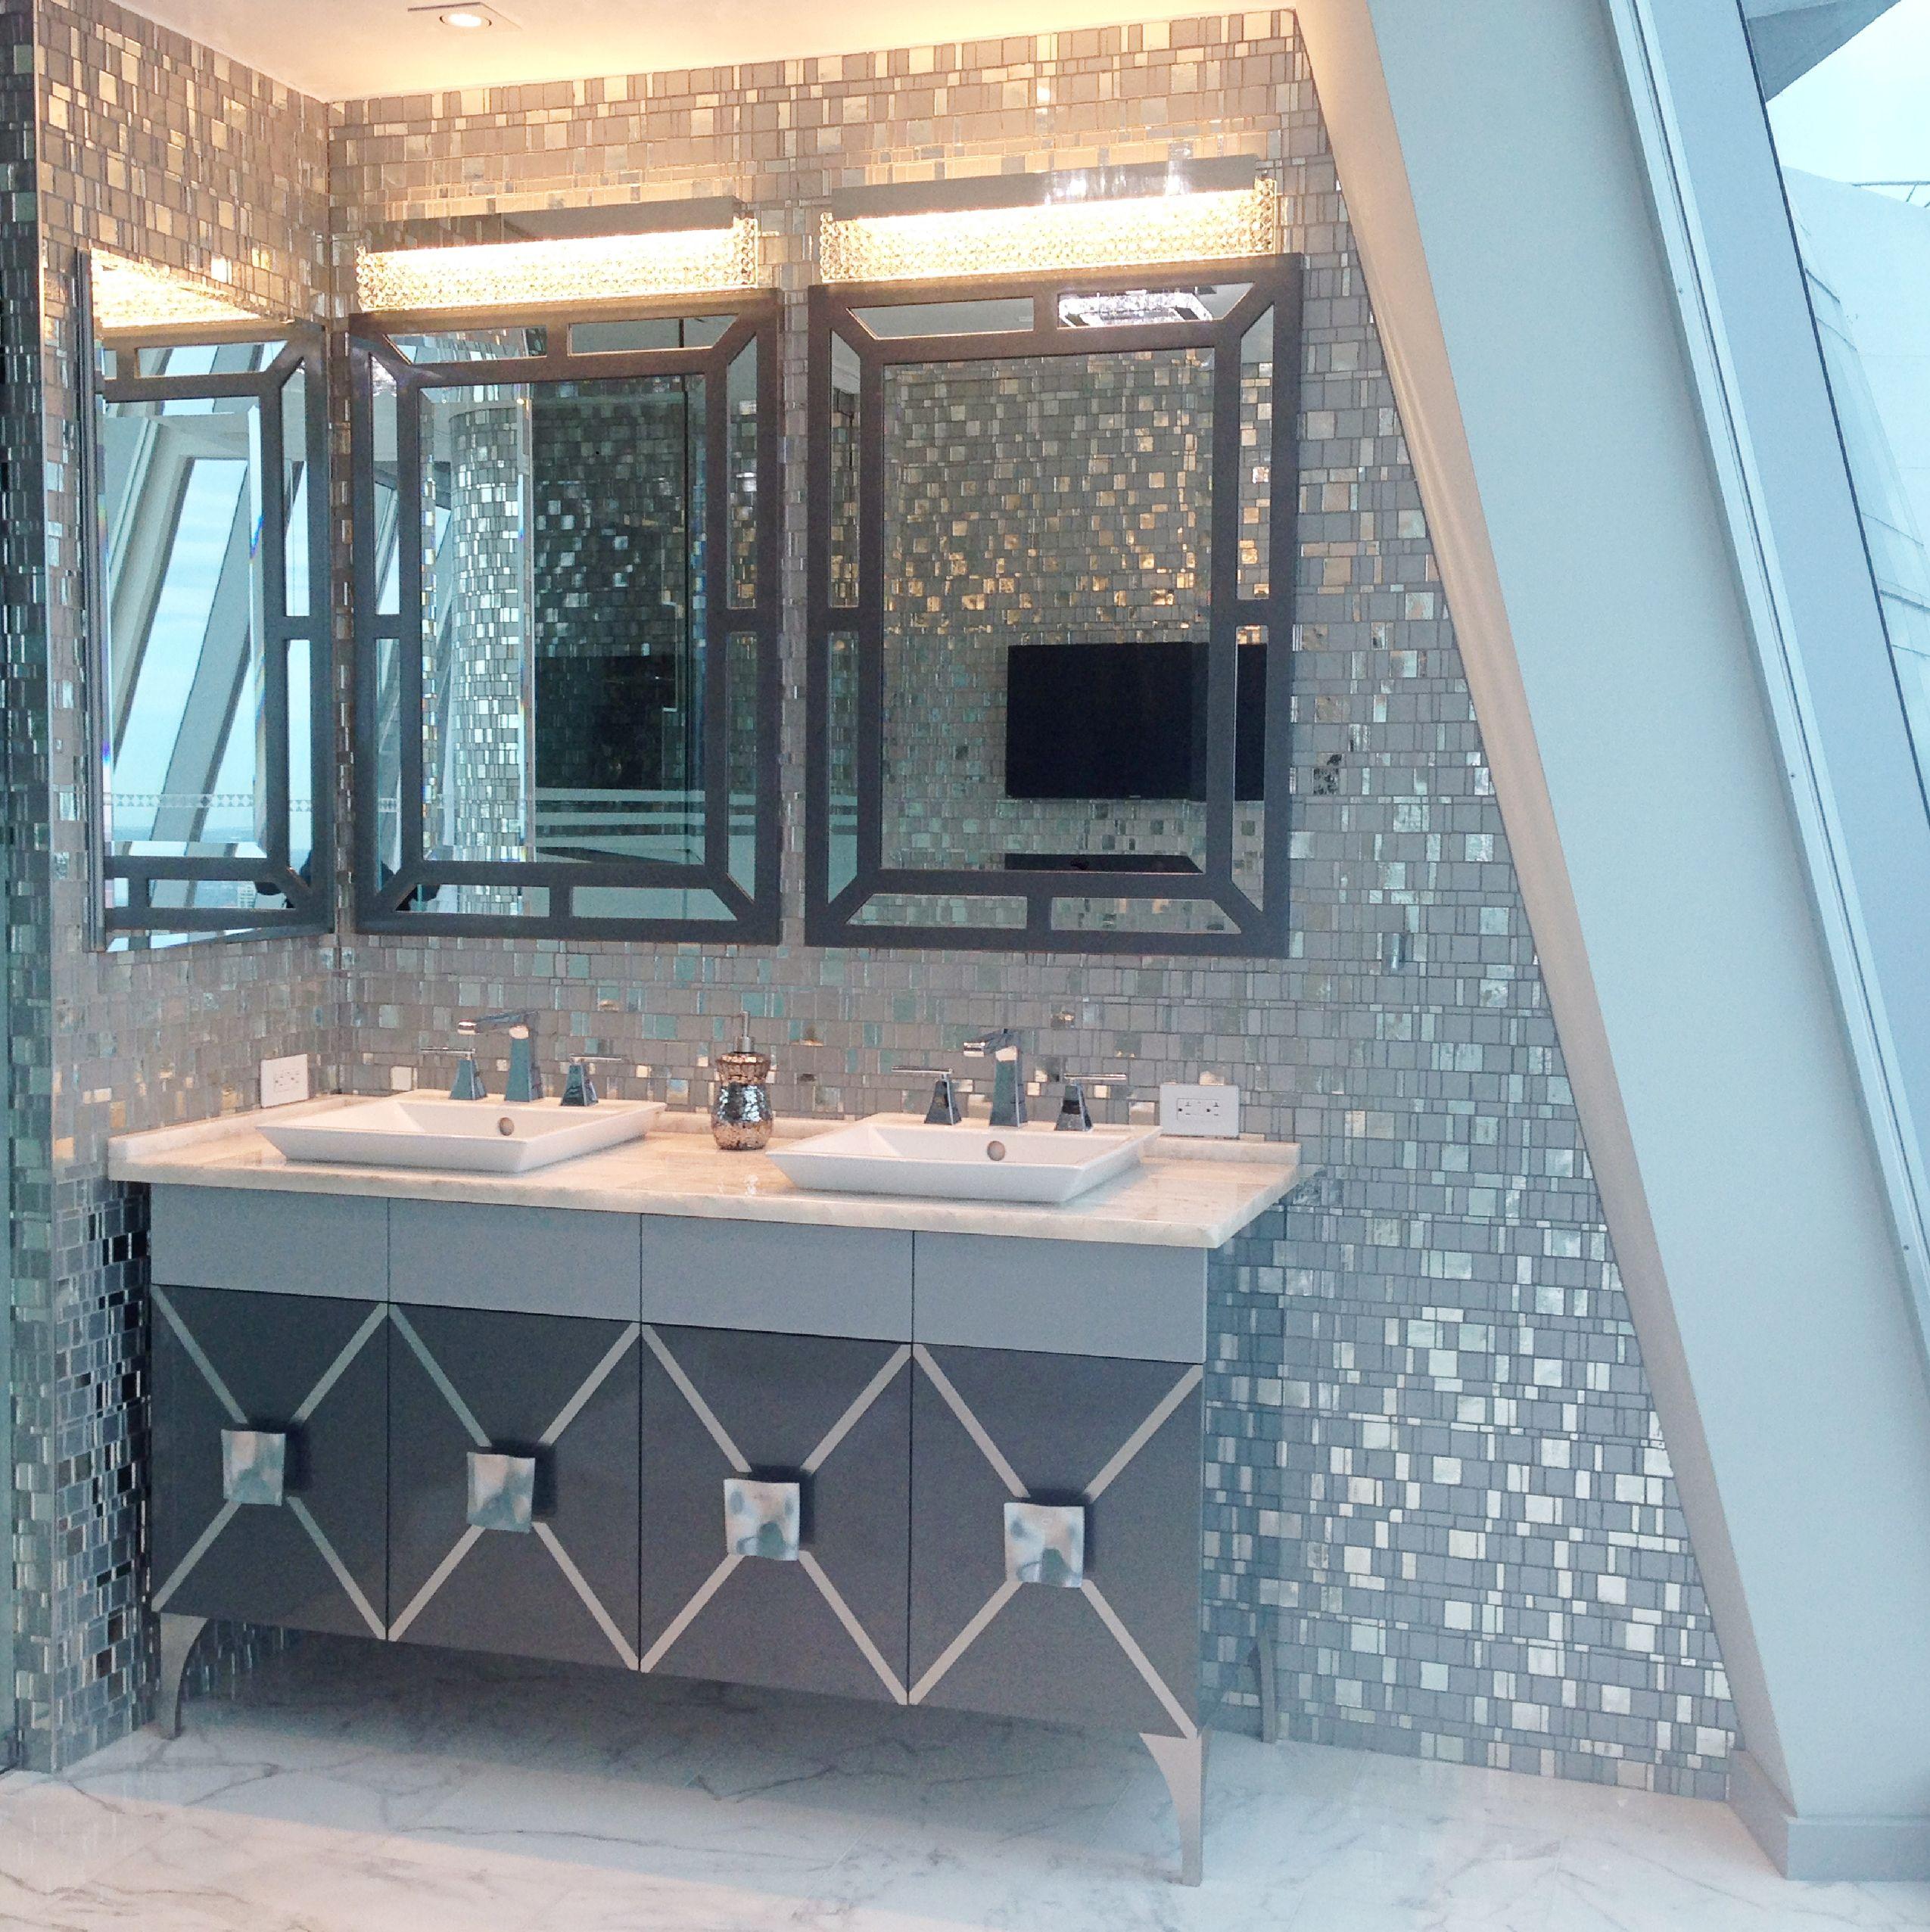 This Bathroom Has A Mosaic Tile Wall Called Liberty Diamond